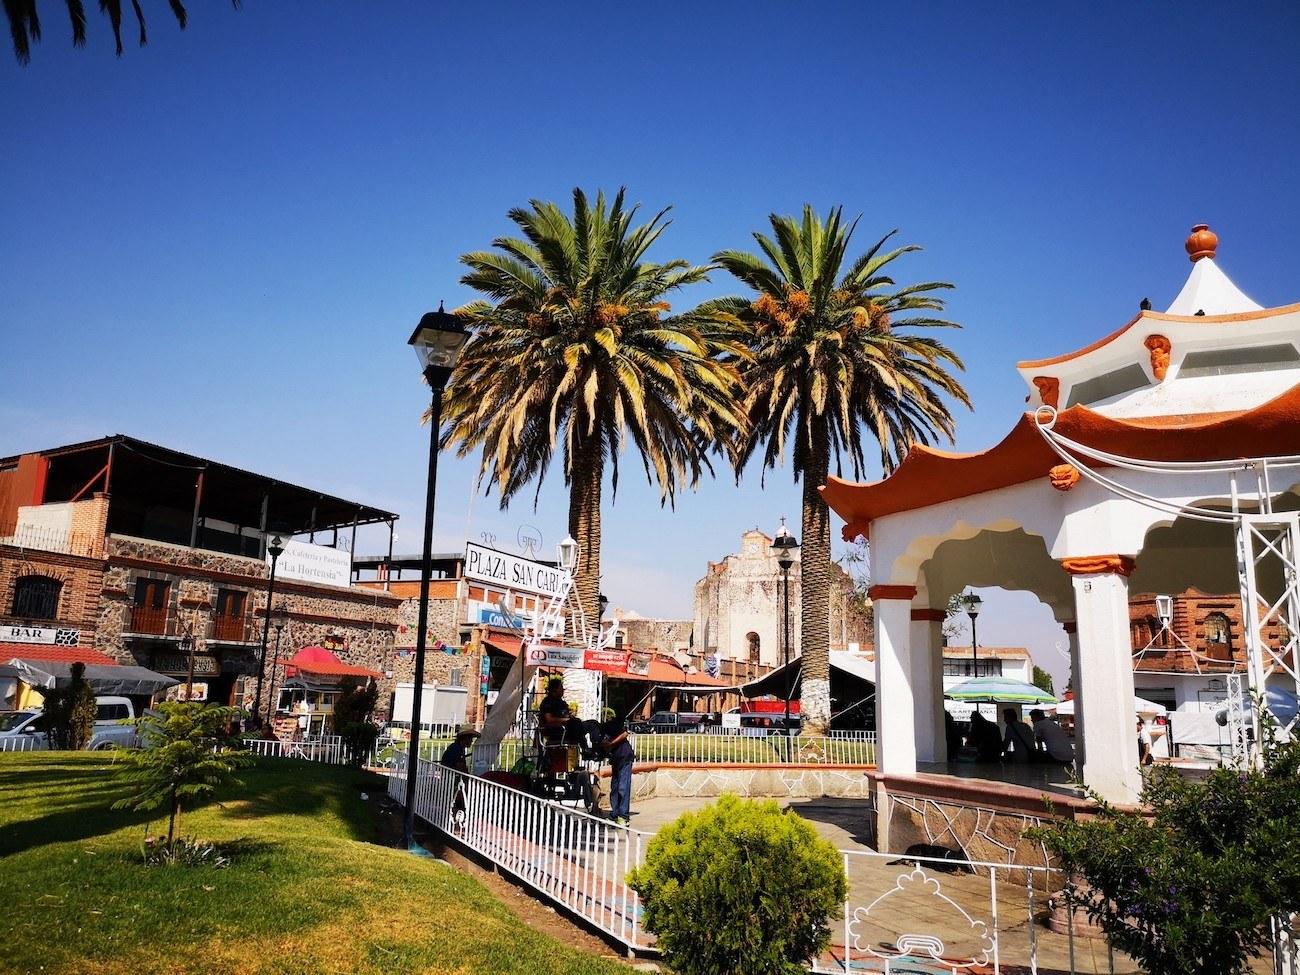 Kiosco Villa de Tezontepec